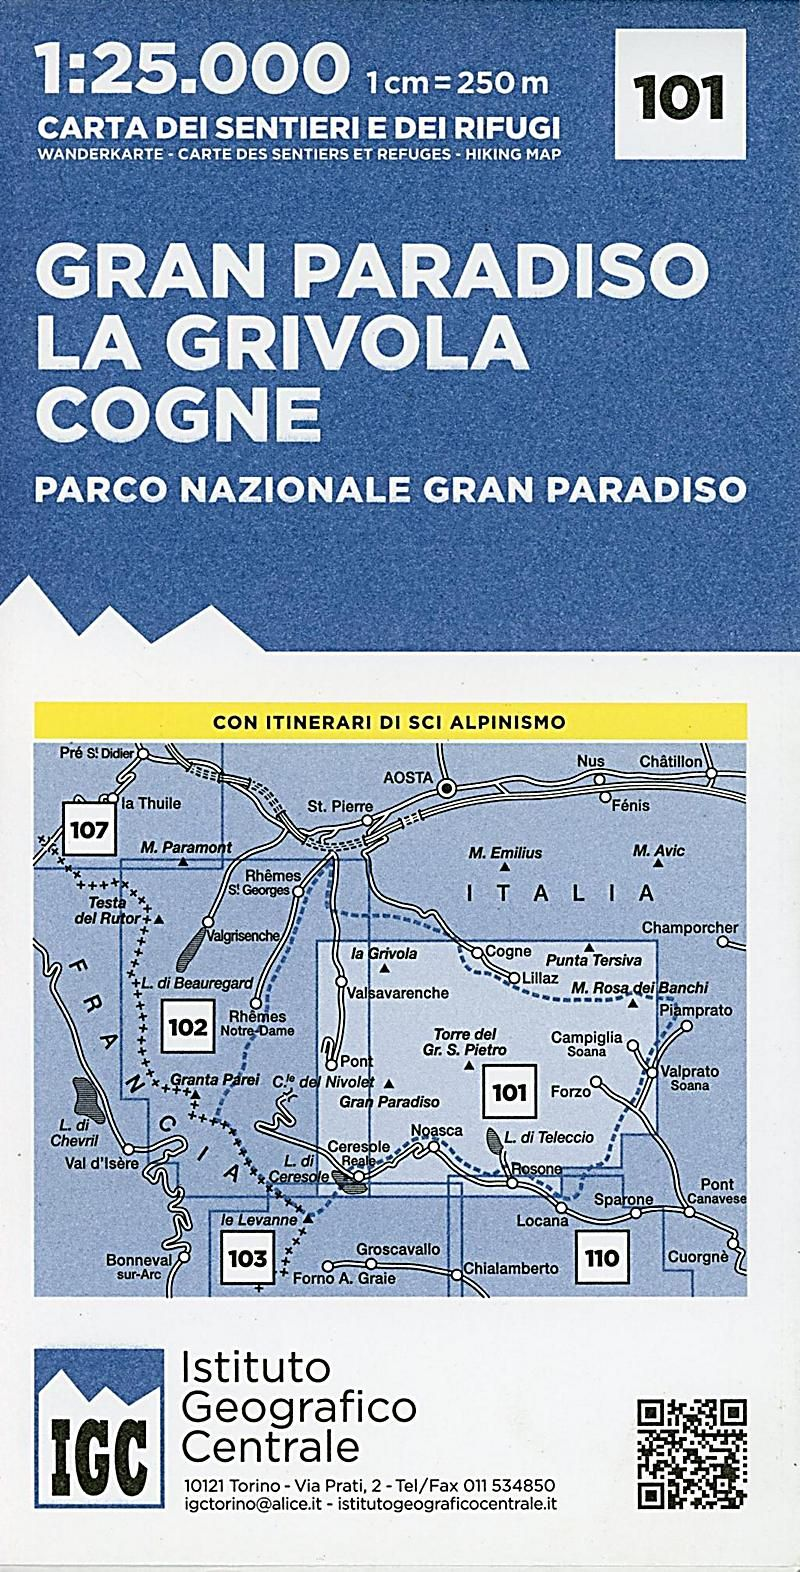 Igc Wanderkarte Gran Paradiso La Grivola Cogne Karte Im